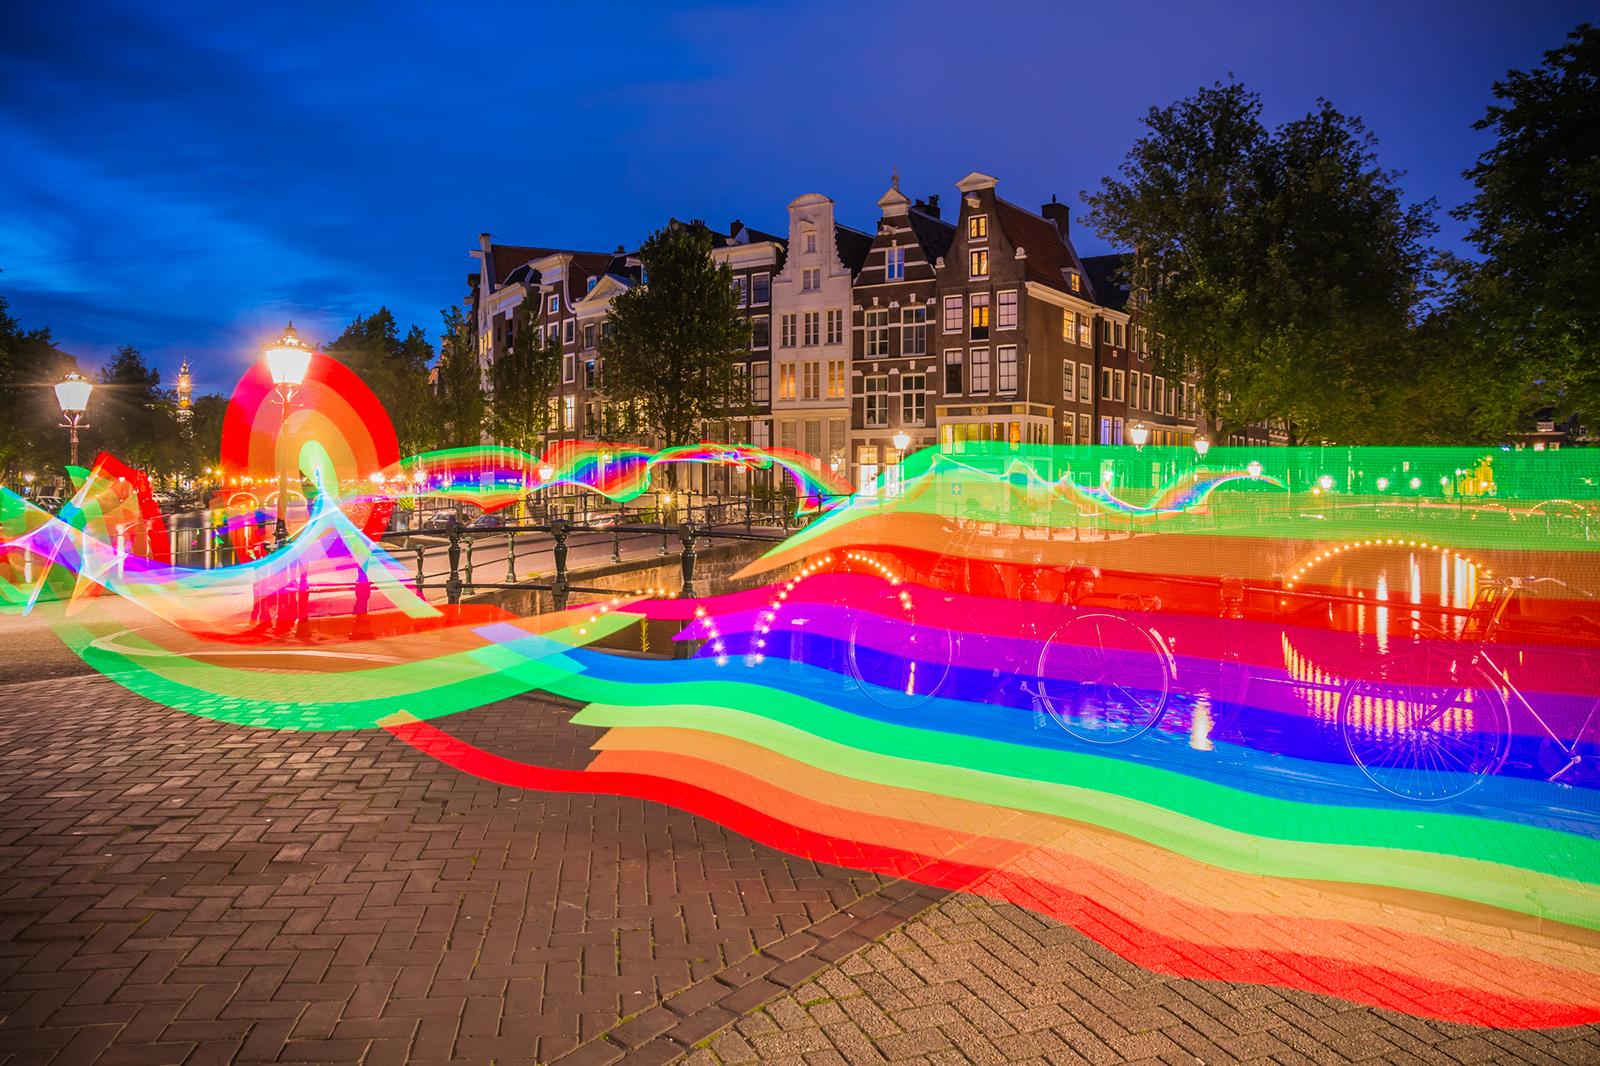 160715_00_rainbow2048croppedjdjphotography